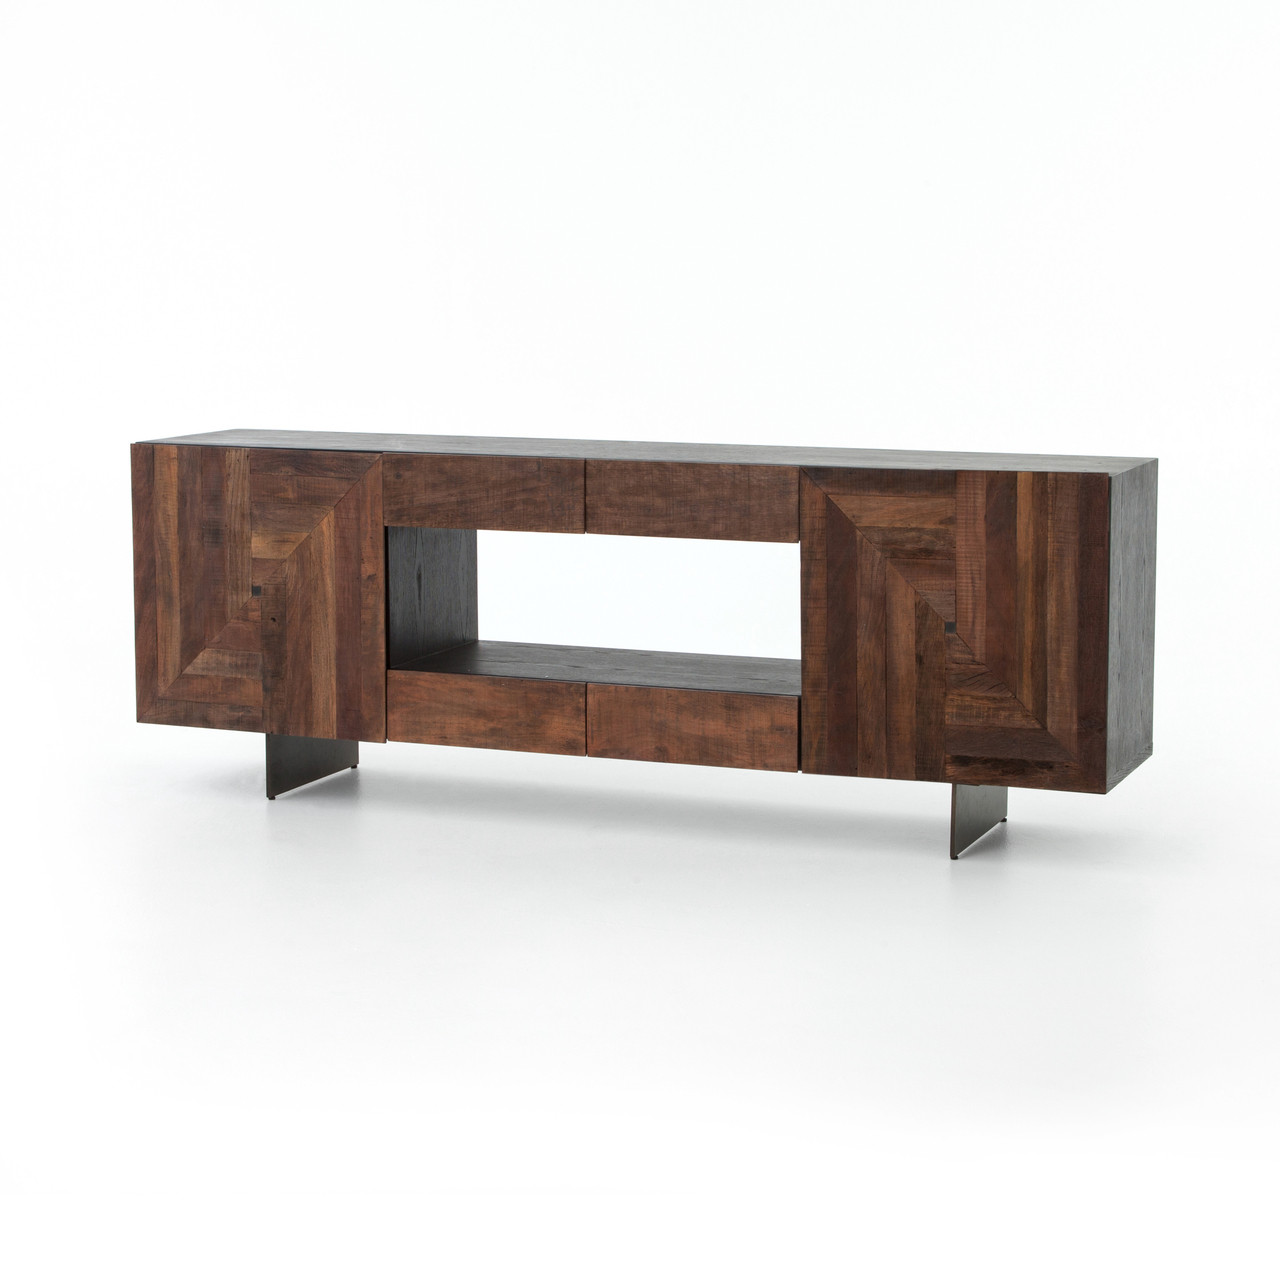 Beau Reclaimed Wood Antique Bronze Leg Media Cabinet